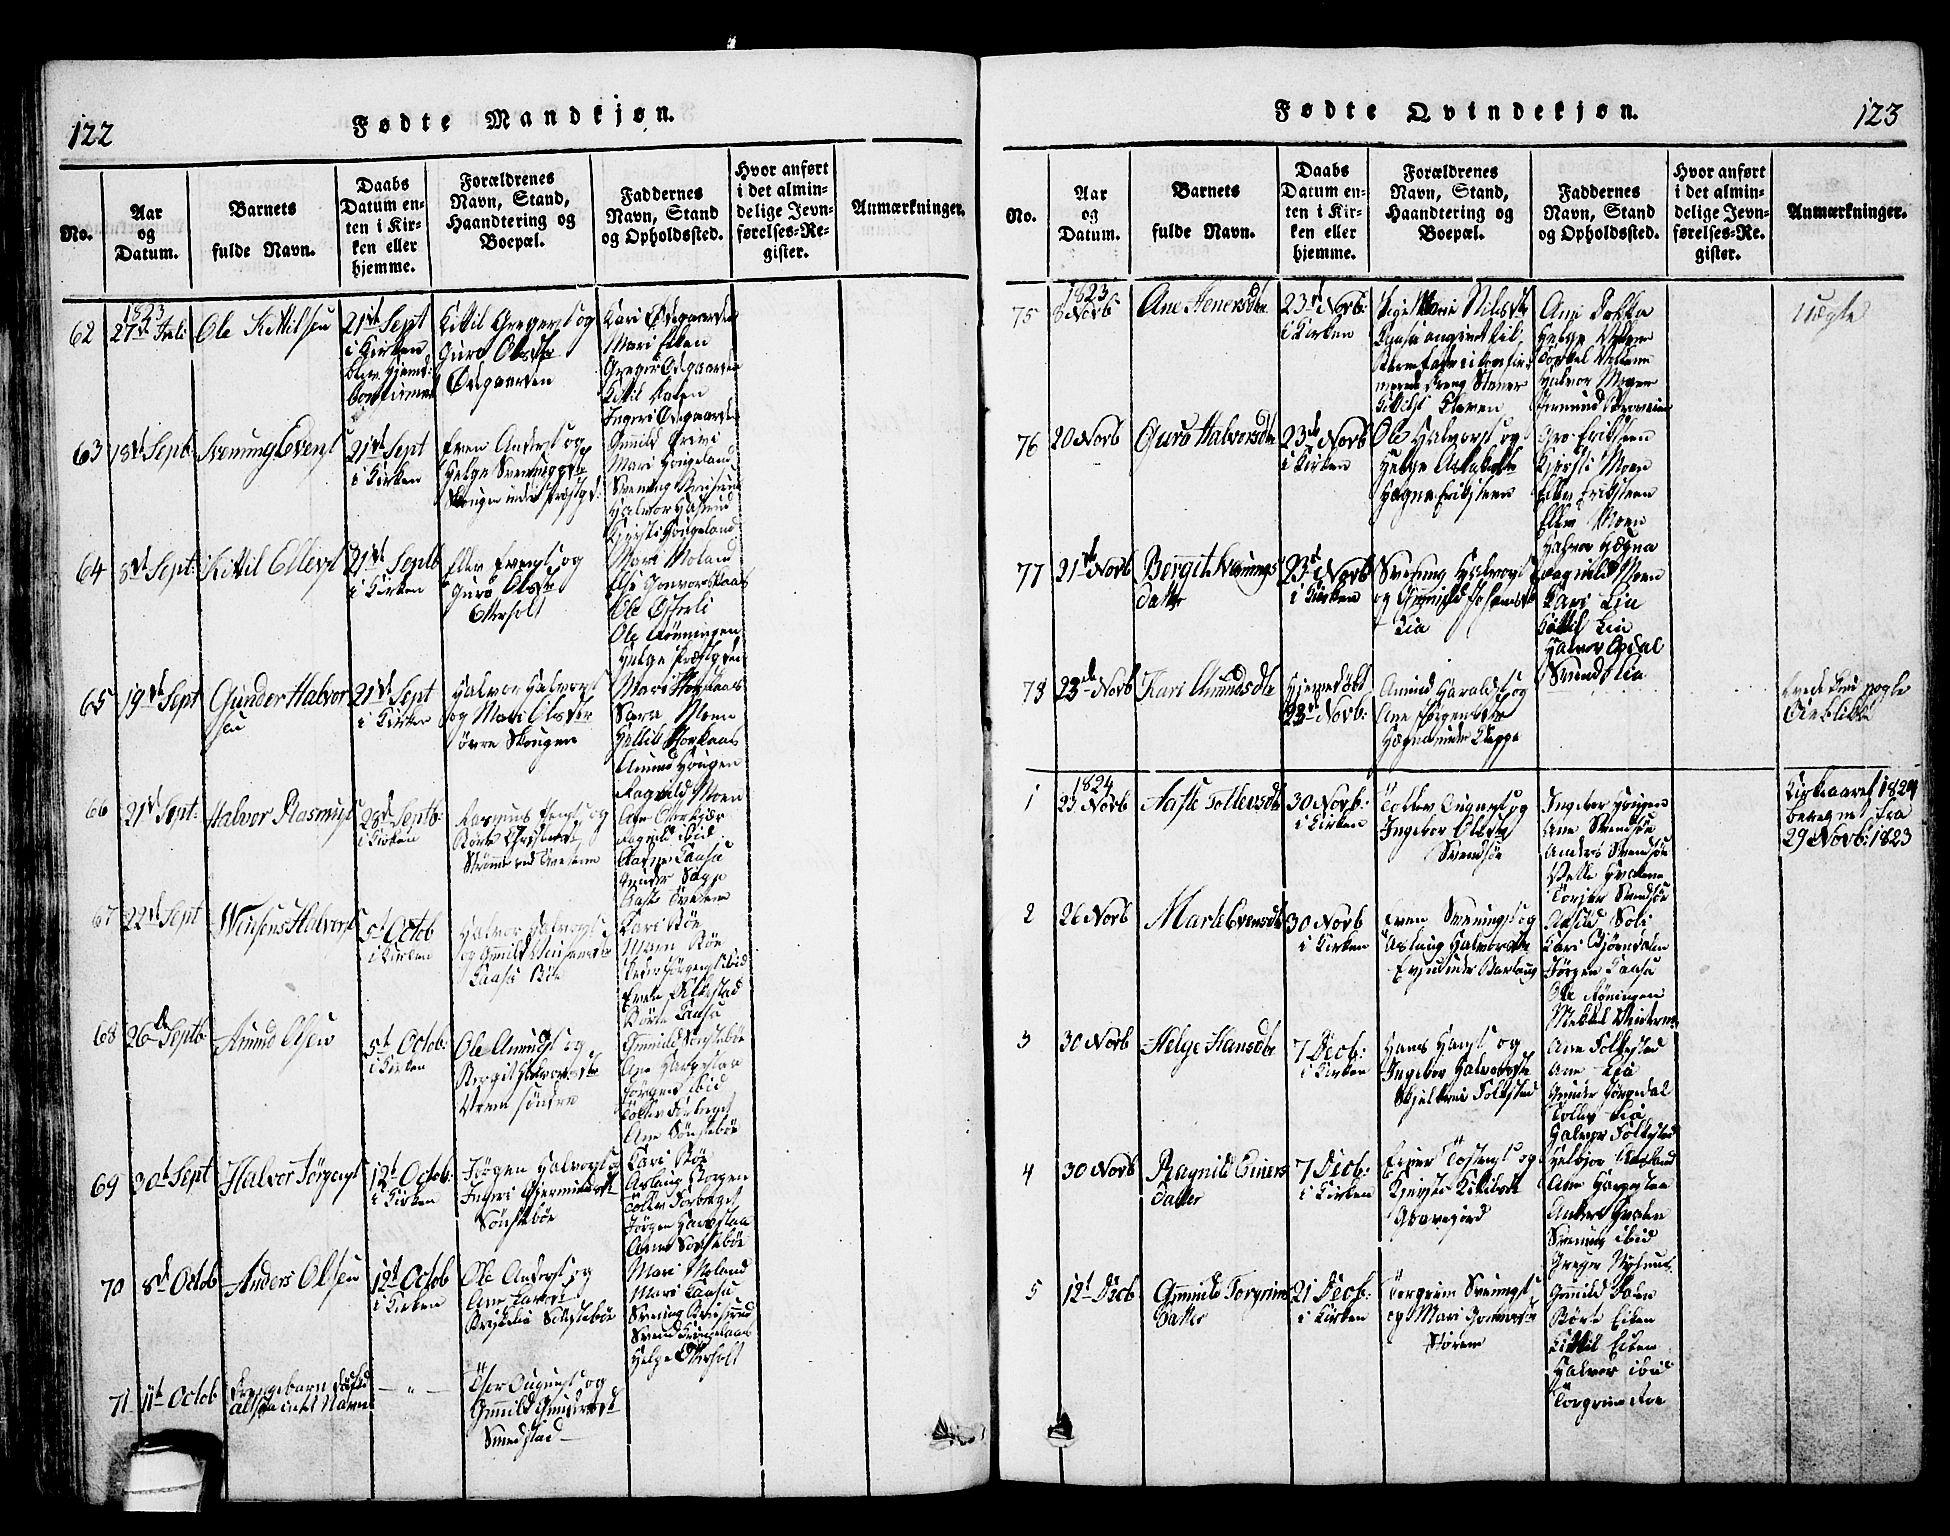 SAKO, Bø kirkebøker, G/Ga/L0001: Klokkerbok nr. 1, 1815-1831, s. 122-123